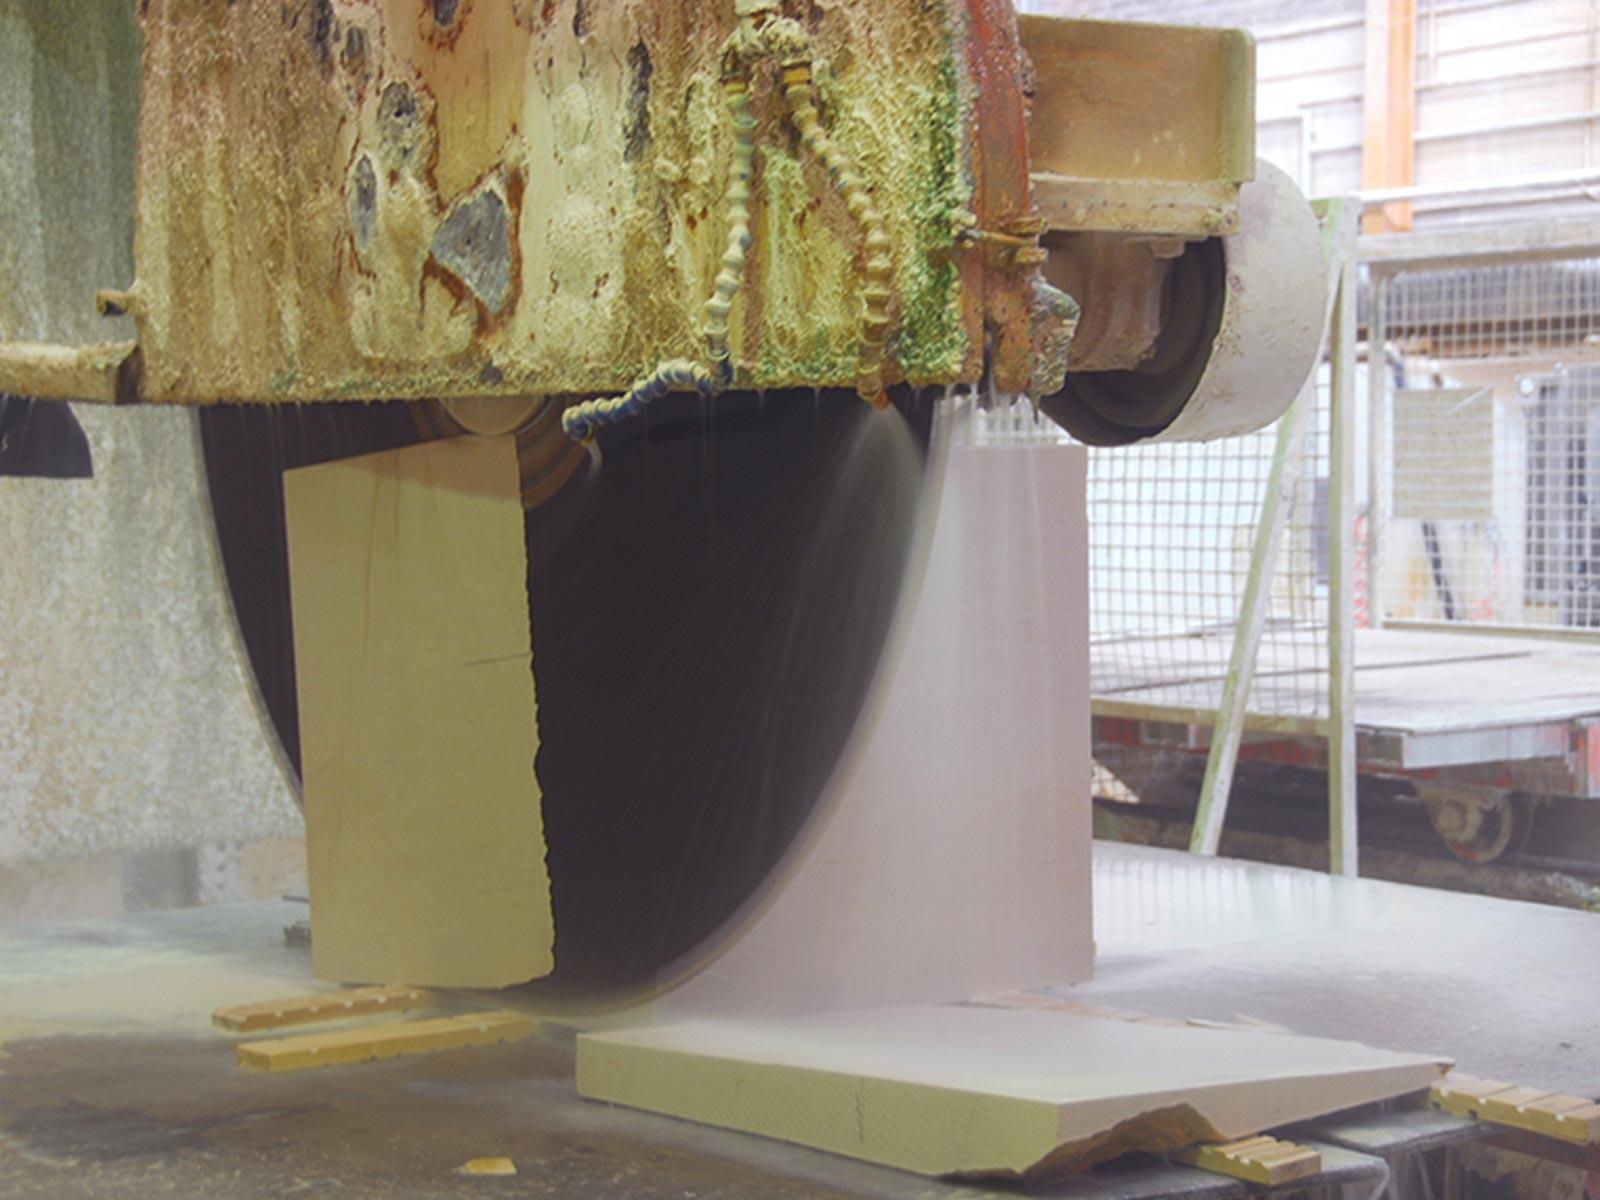 Making the Marcel wine storage monolith